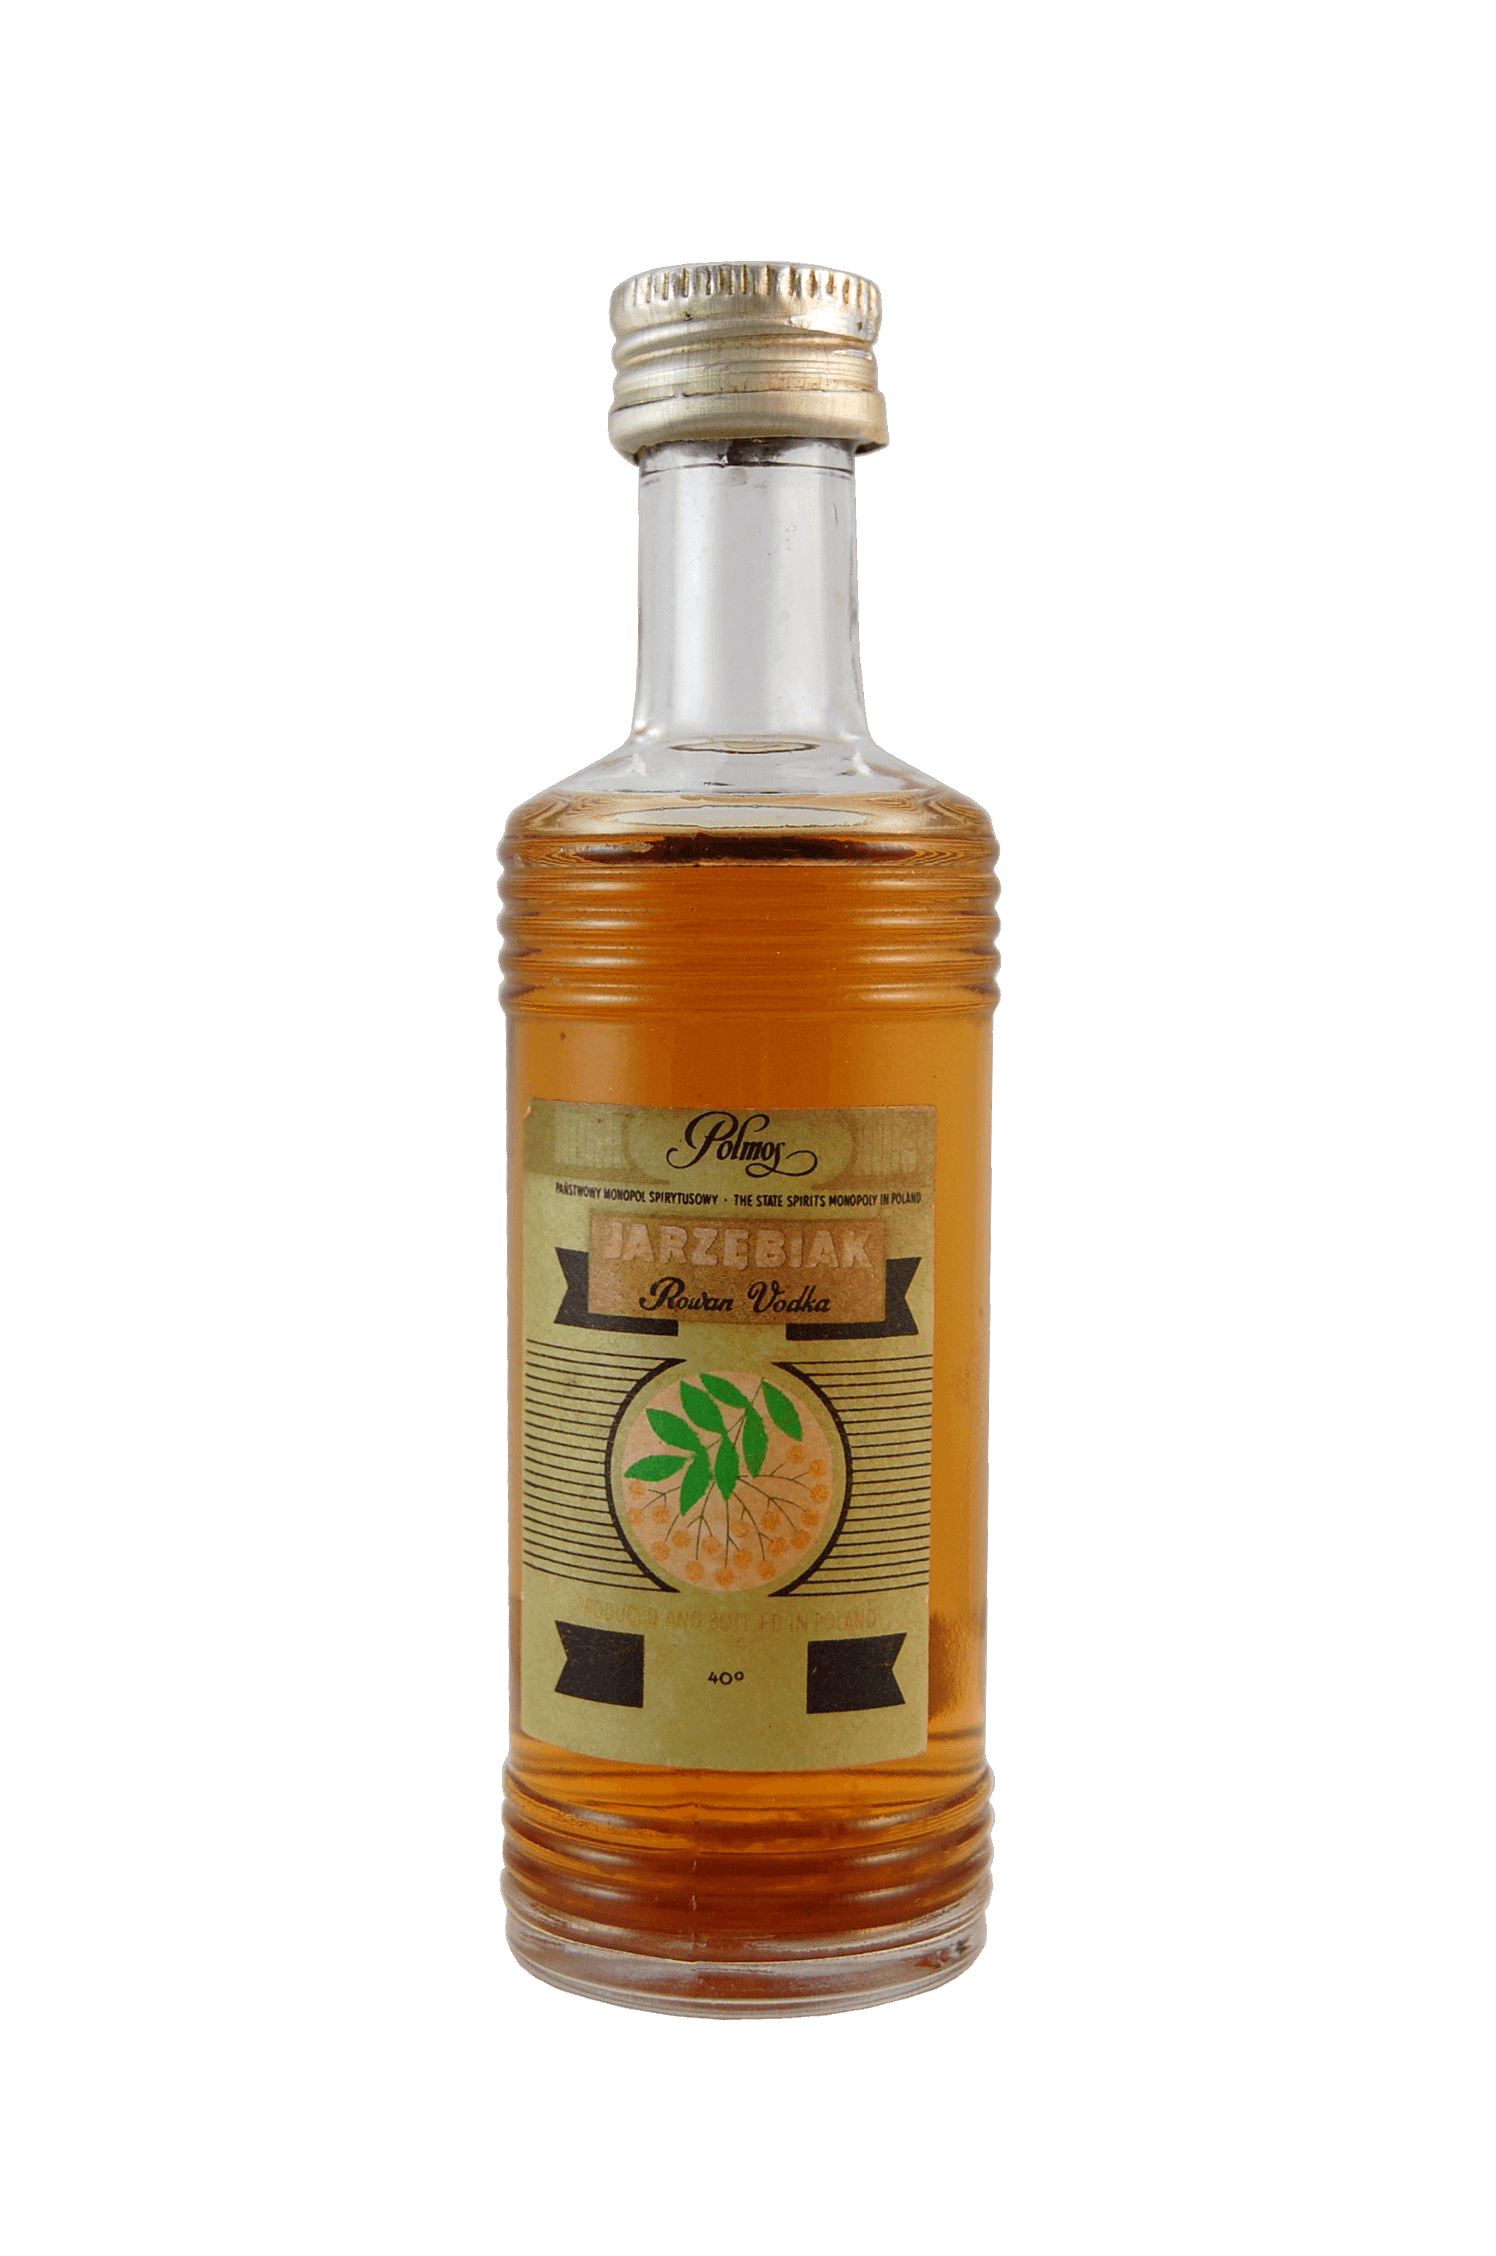 Jarzebiak Rowan Vodka